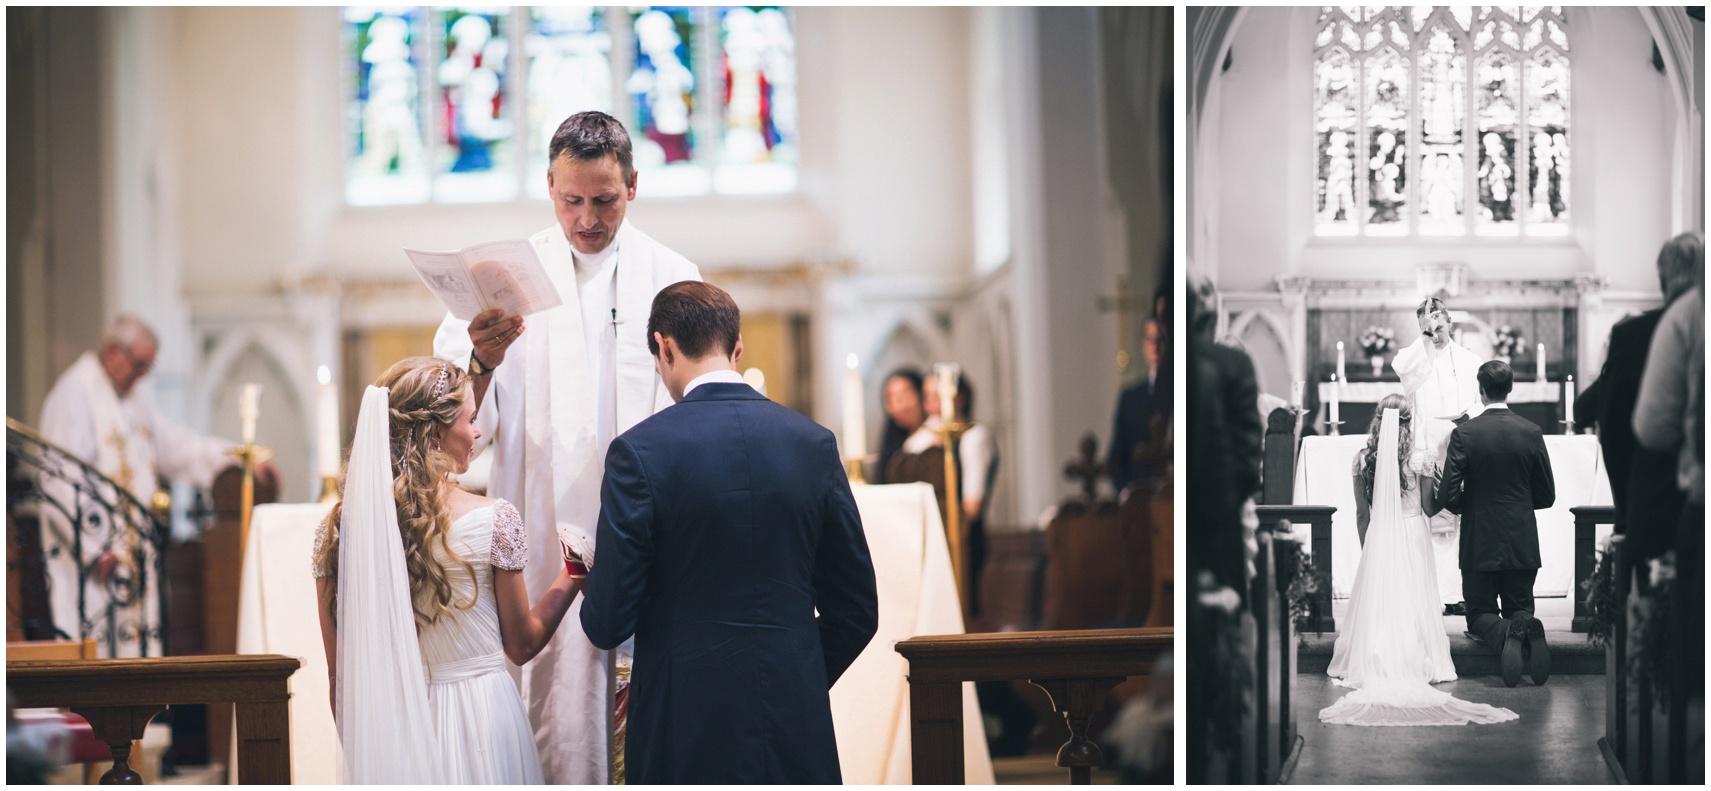 BMC Wedding photography Rutland_0291.jpg